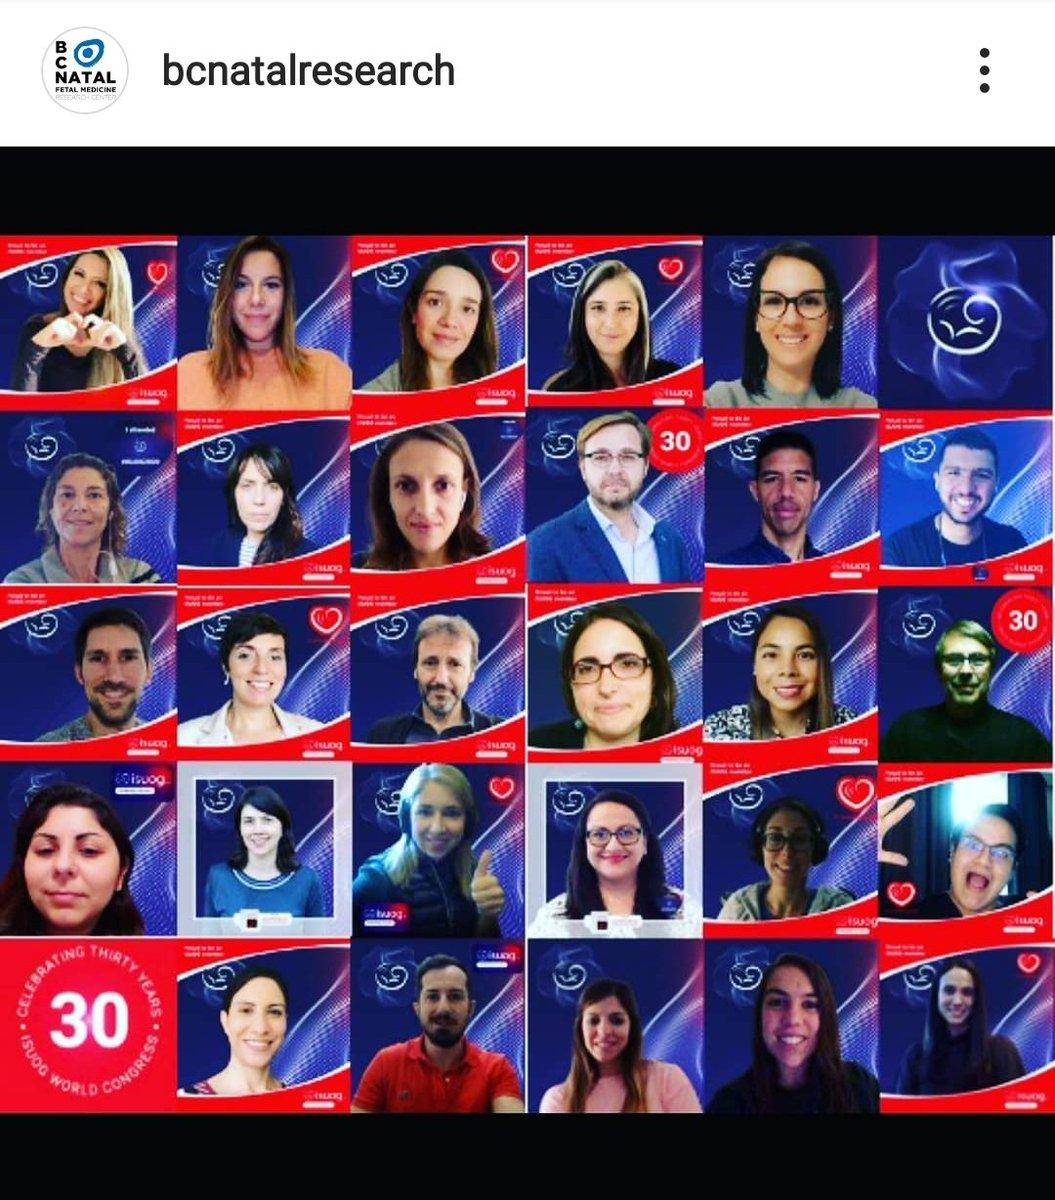 Group photo after a successful @ISUOG Virtual Congress. So happy to be part of @BCNatalResearch team.  #isuog2020 @GratacosEduard @FatimaCrispi @elisendaeixarch @IllaMiriam @crovetto_franci @japh19 @doctorafer @Raigam_Martinez @Paz_A_D @JezidMiranda @LinaYoussef17 @lucastrigo https://t.co/9AiQ5AyAHT